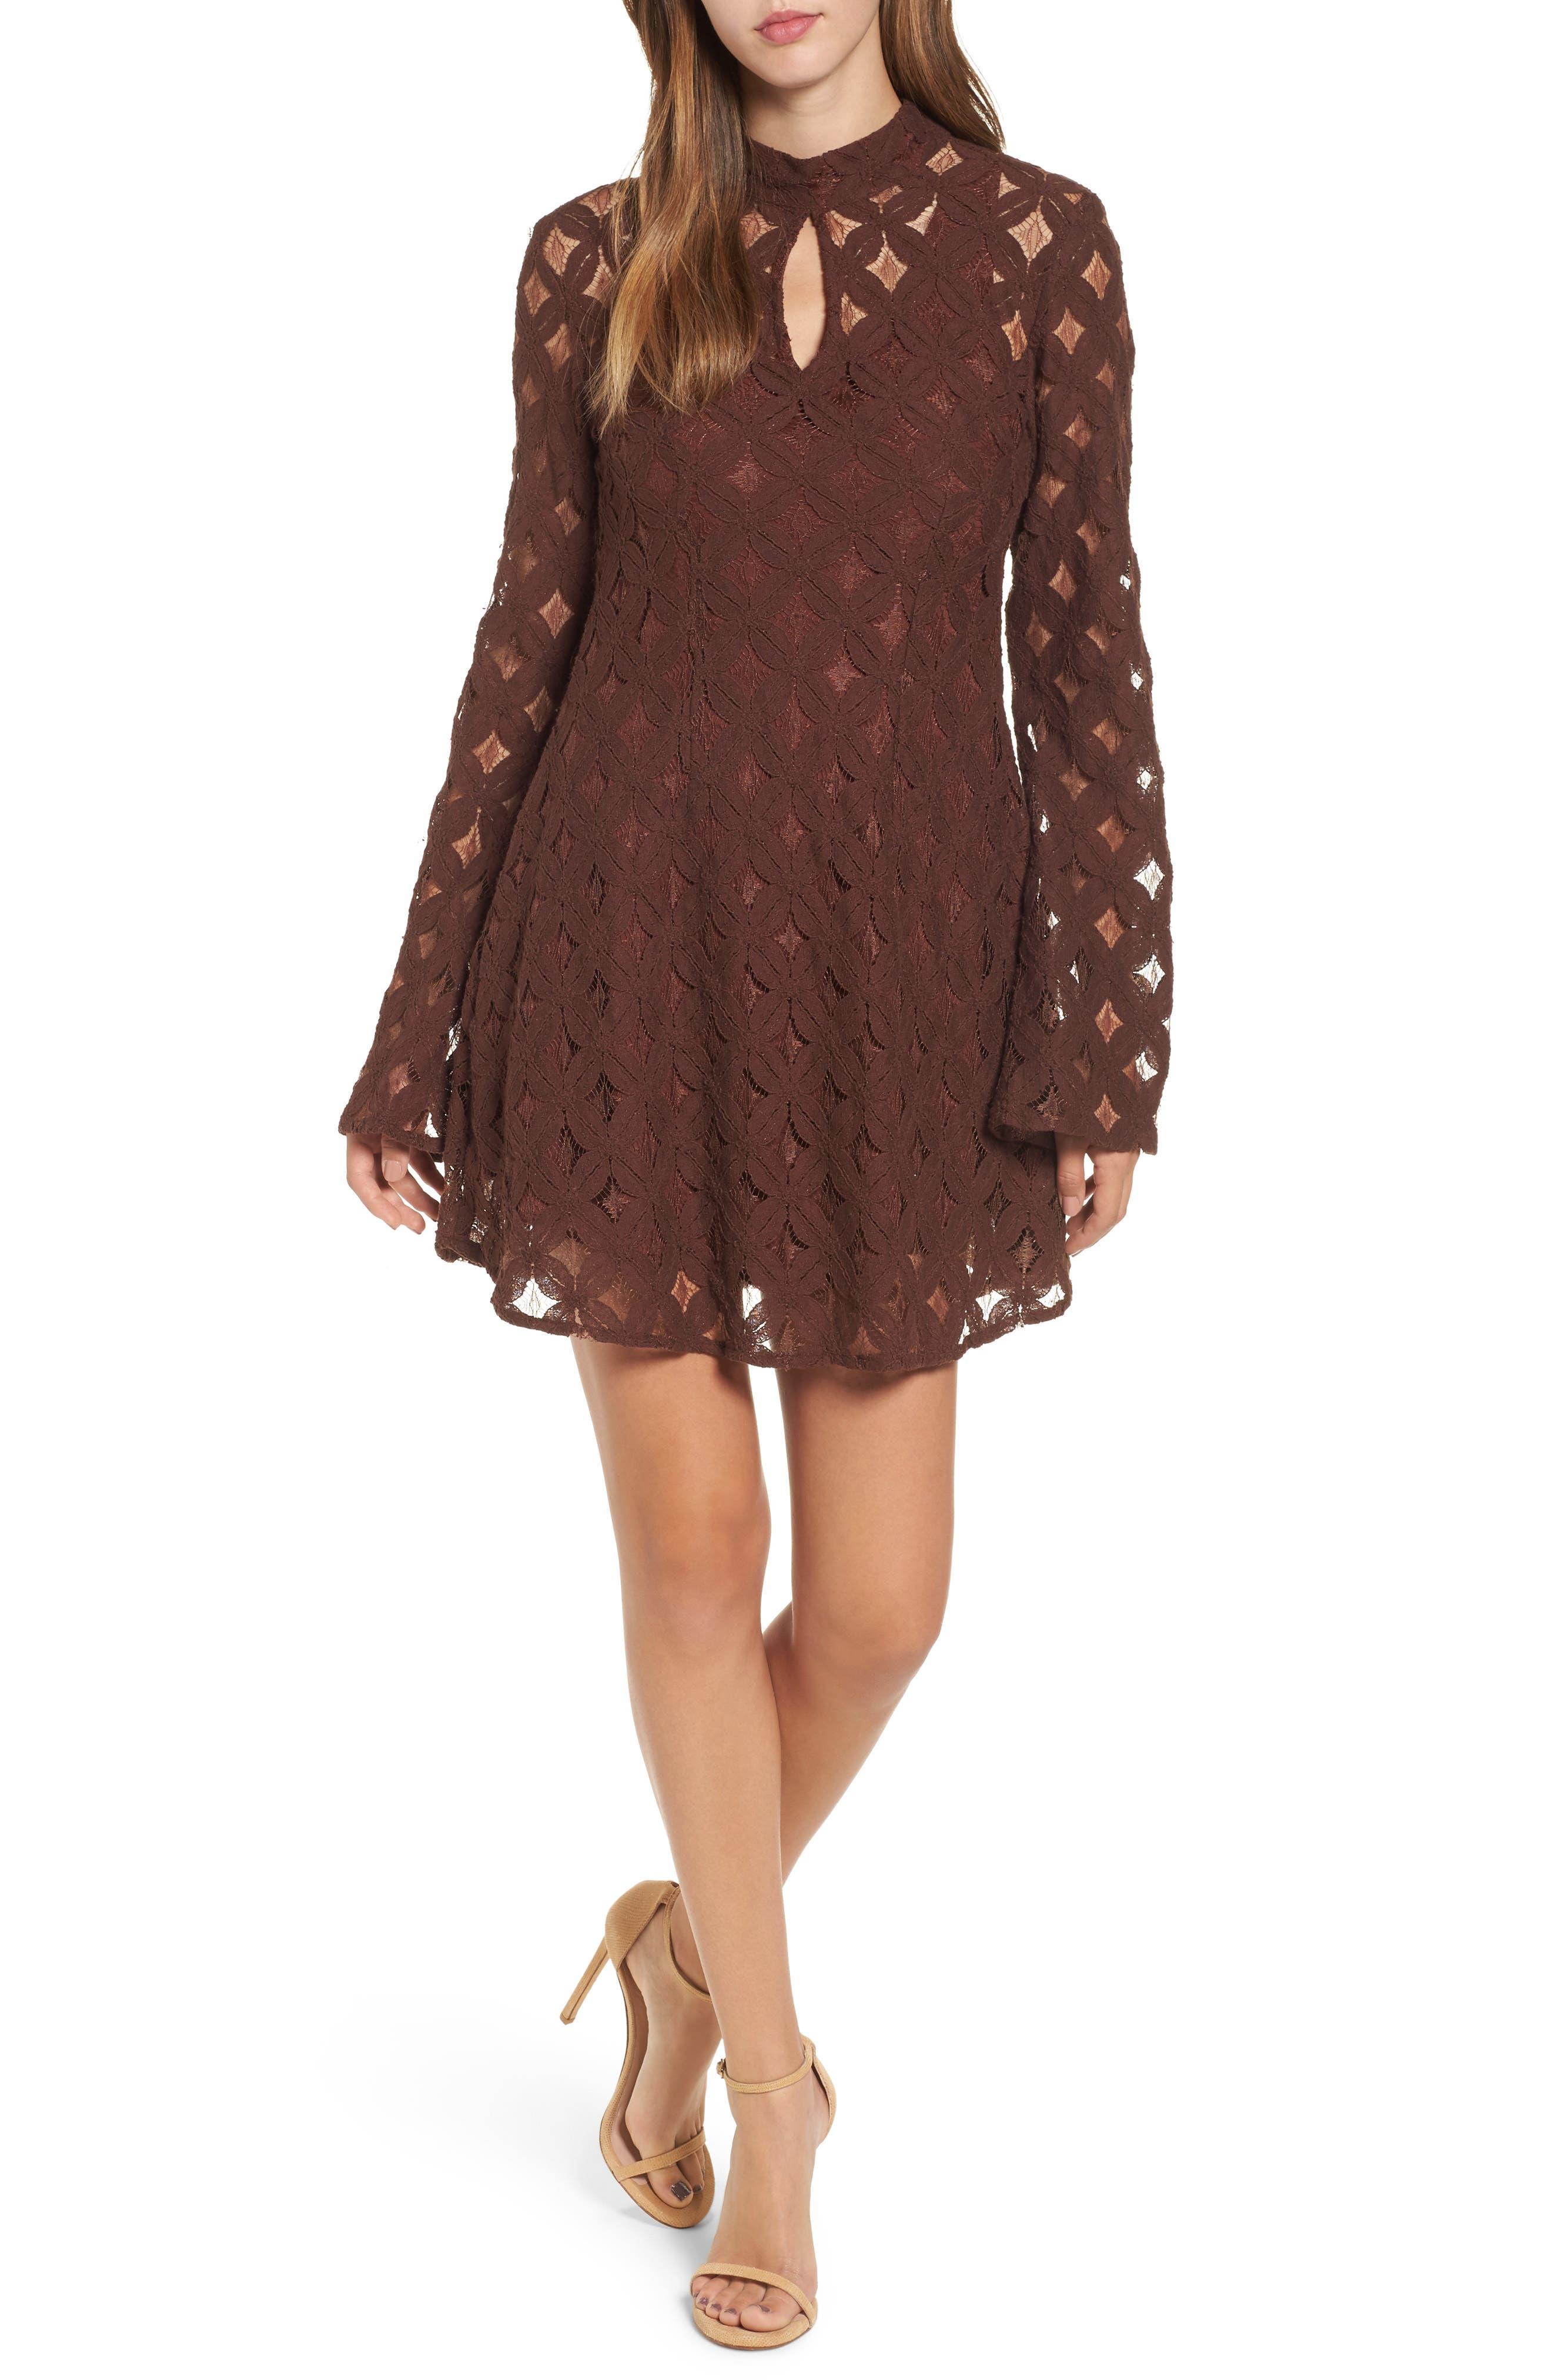 SOMEDAYS LOVIN Crimson Hearts Lace Dress